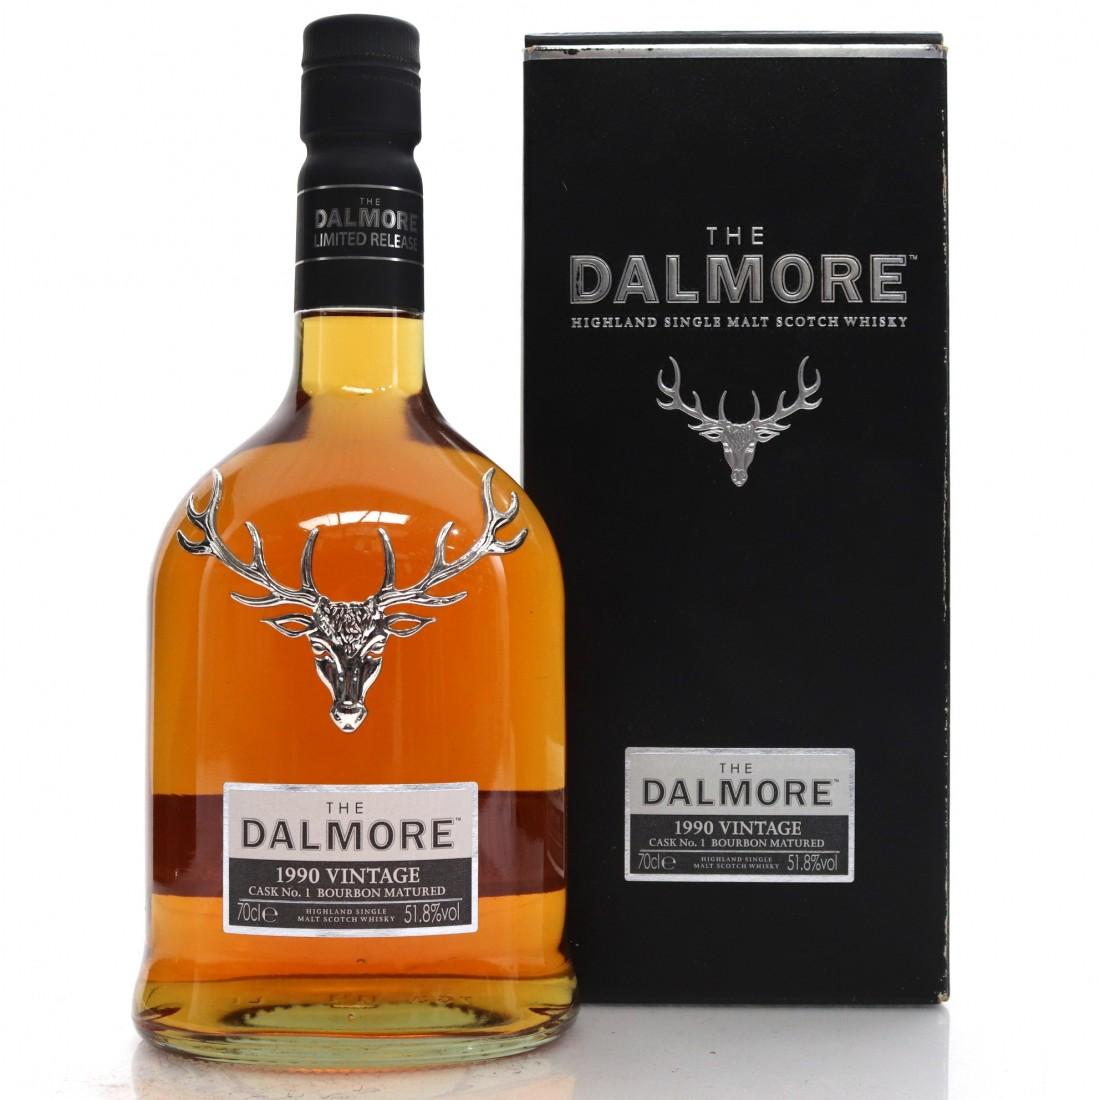 Dalmore 1990 Vintage Cask No.1 Bourbon Matured